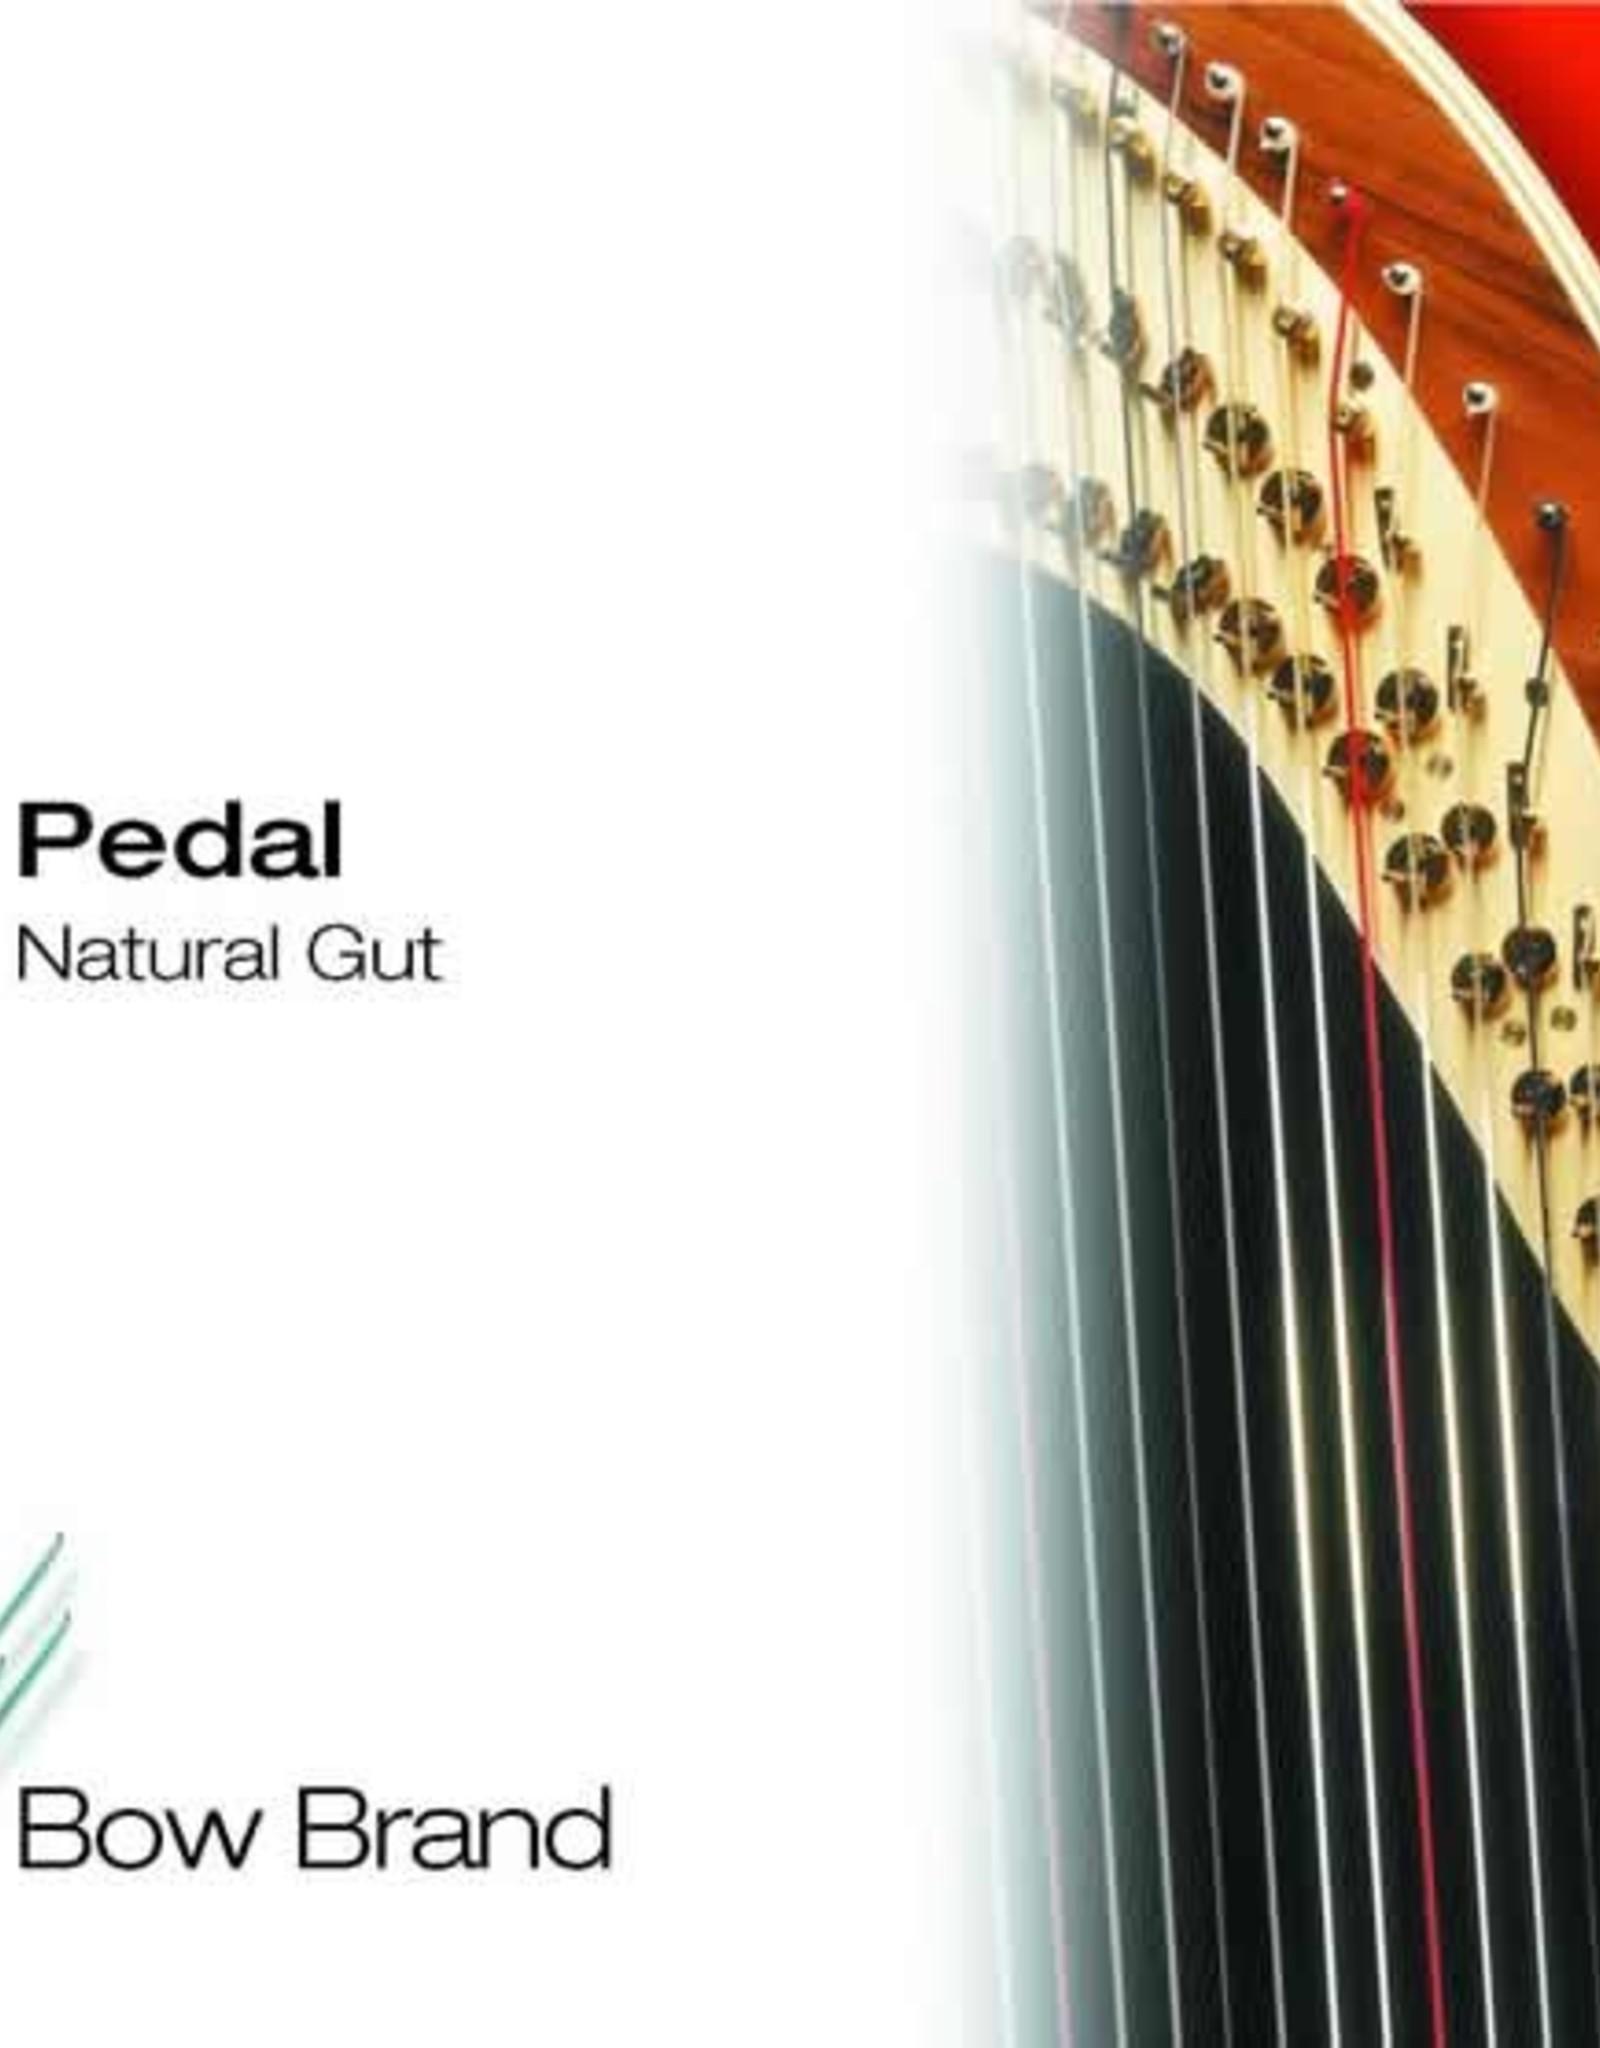 BOW BRAND  pedaal darm - pedal STD GUT 31/5do